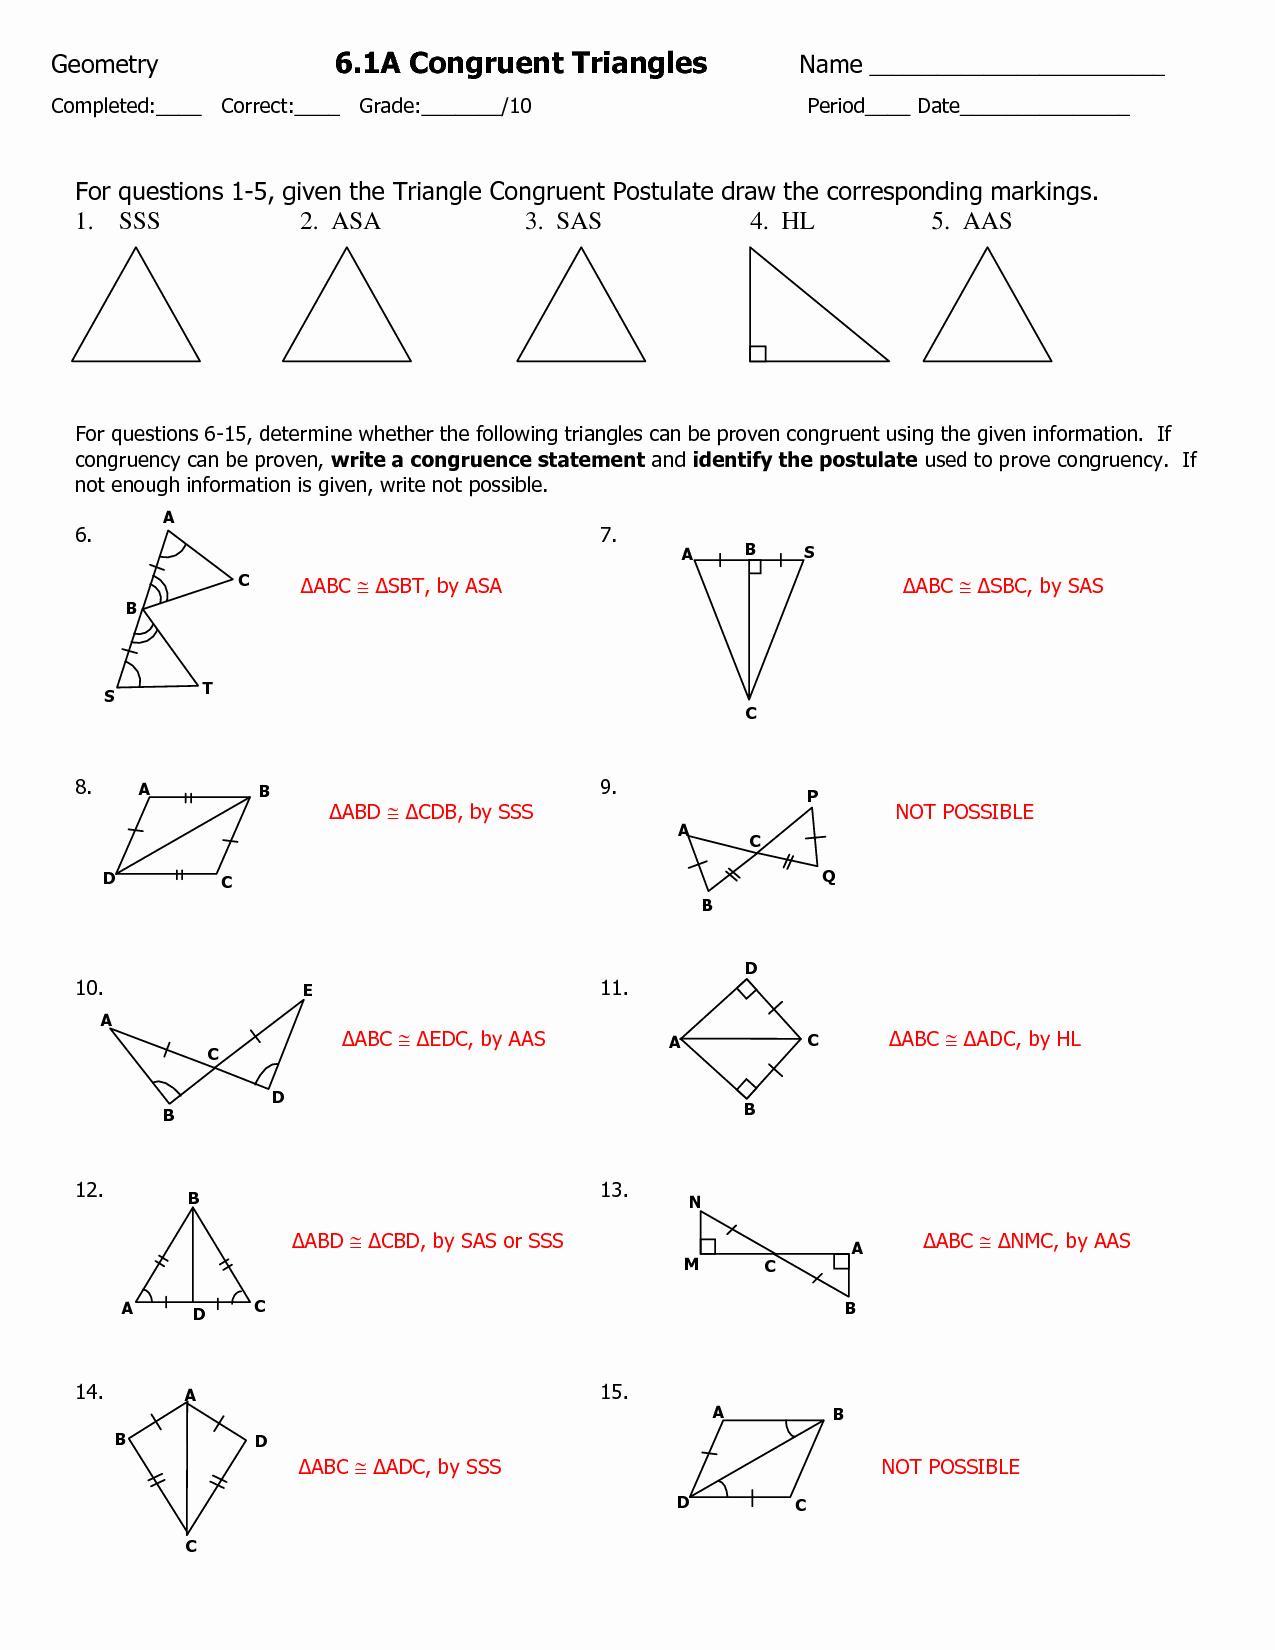 50 Geometry Worksheet Congruent Triangles